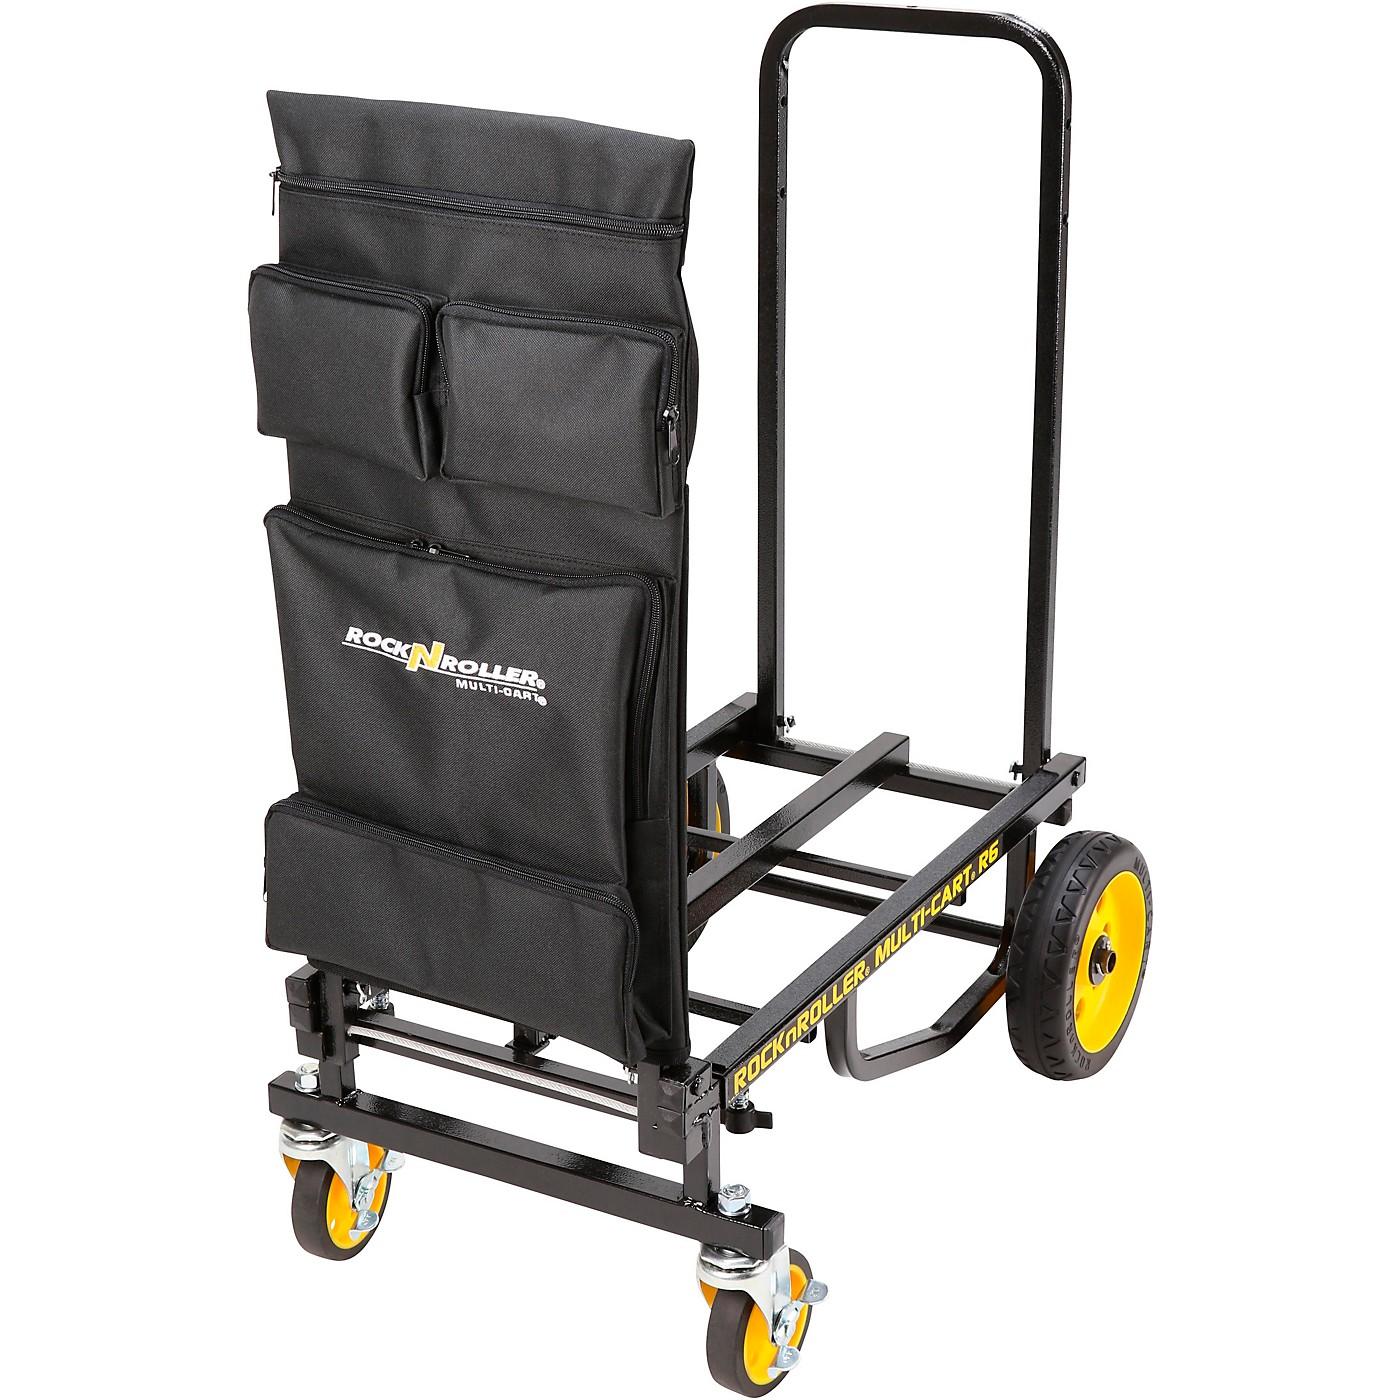 Rock N Roller RSA-TAB6 Small Multi-Pocket Tool/Accessory Bag (Fits R2, R6 Carts) thumbnail